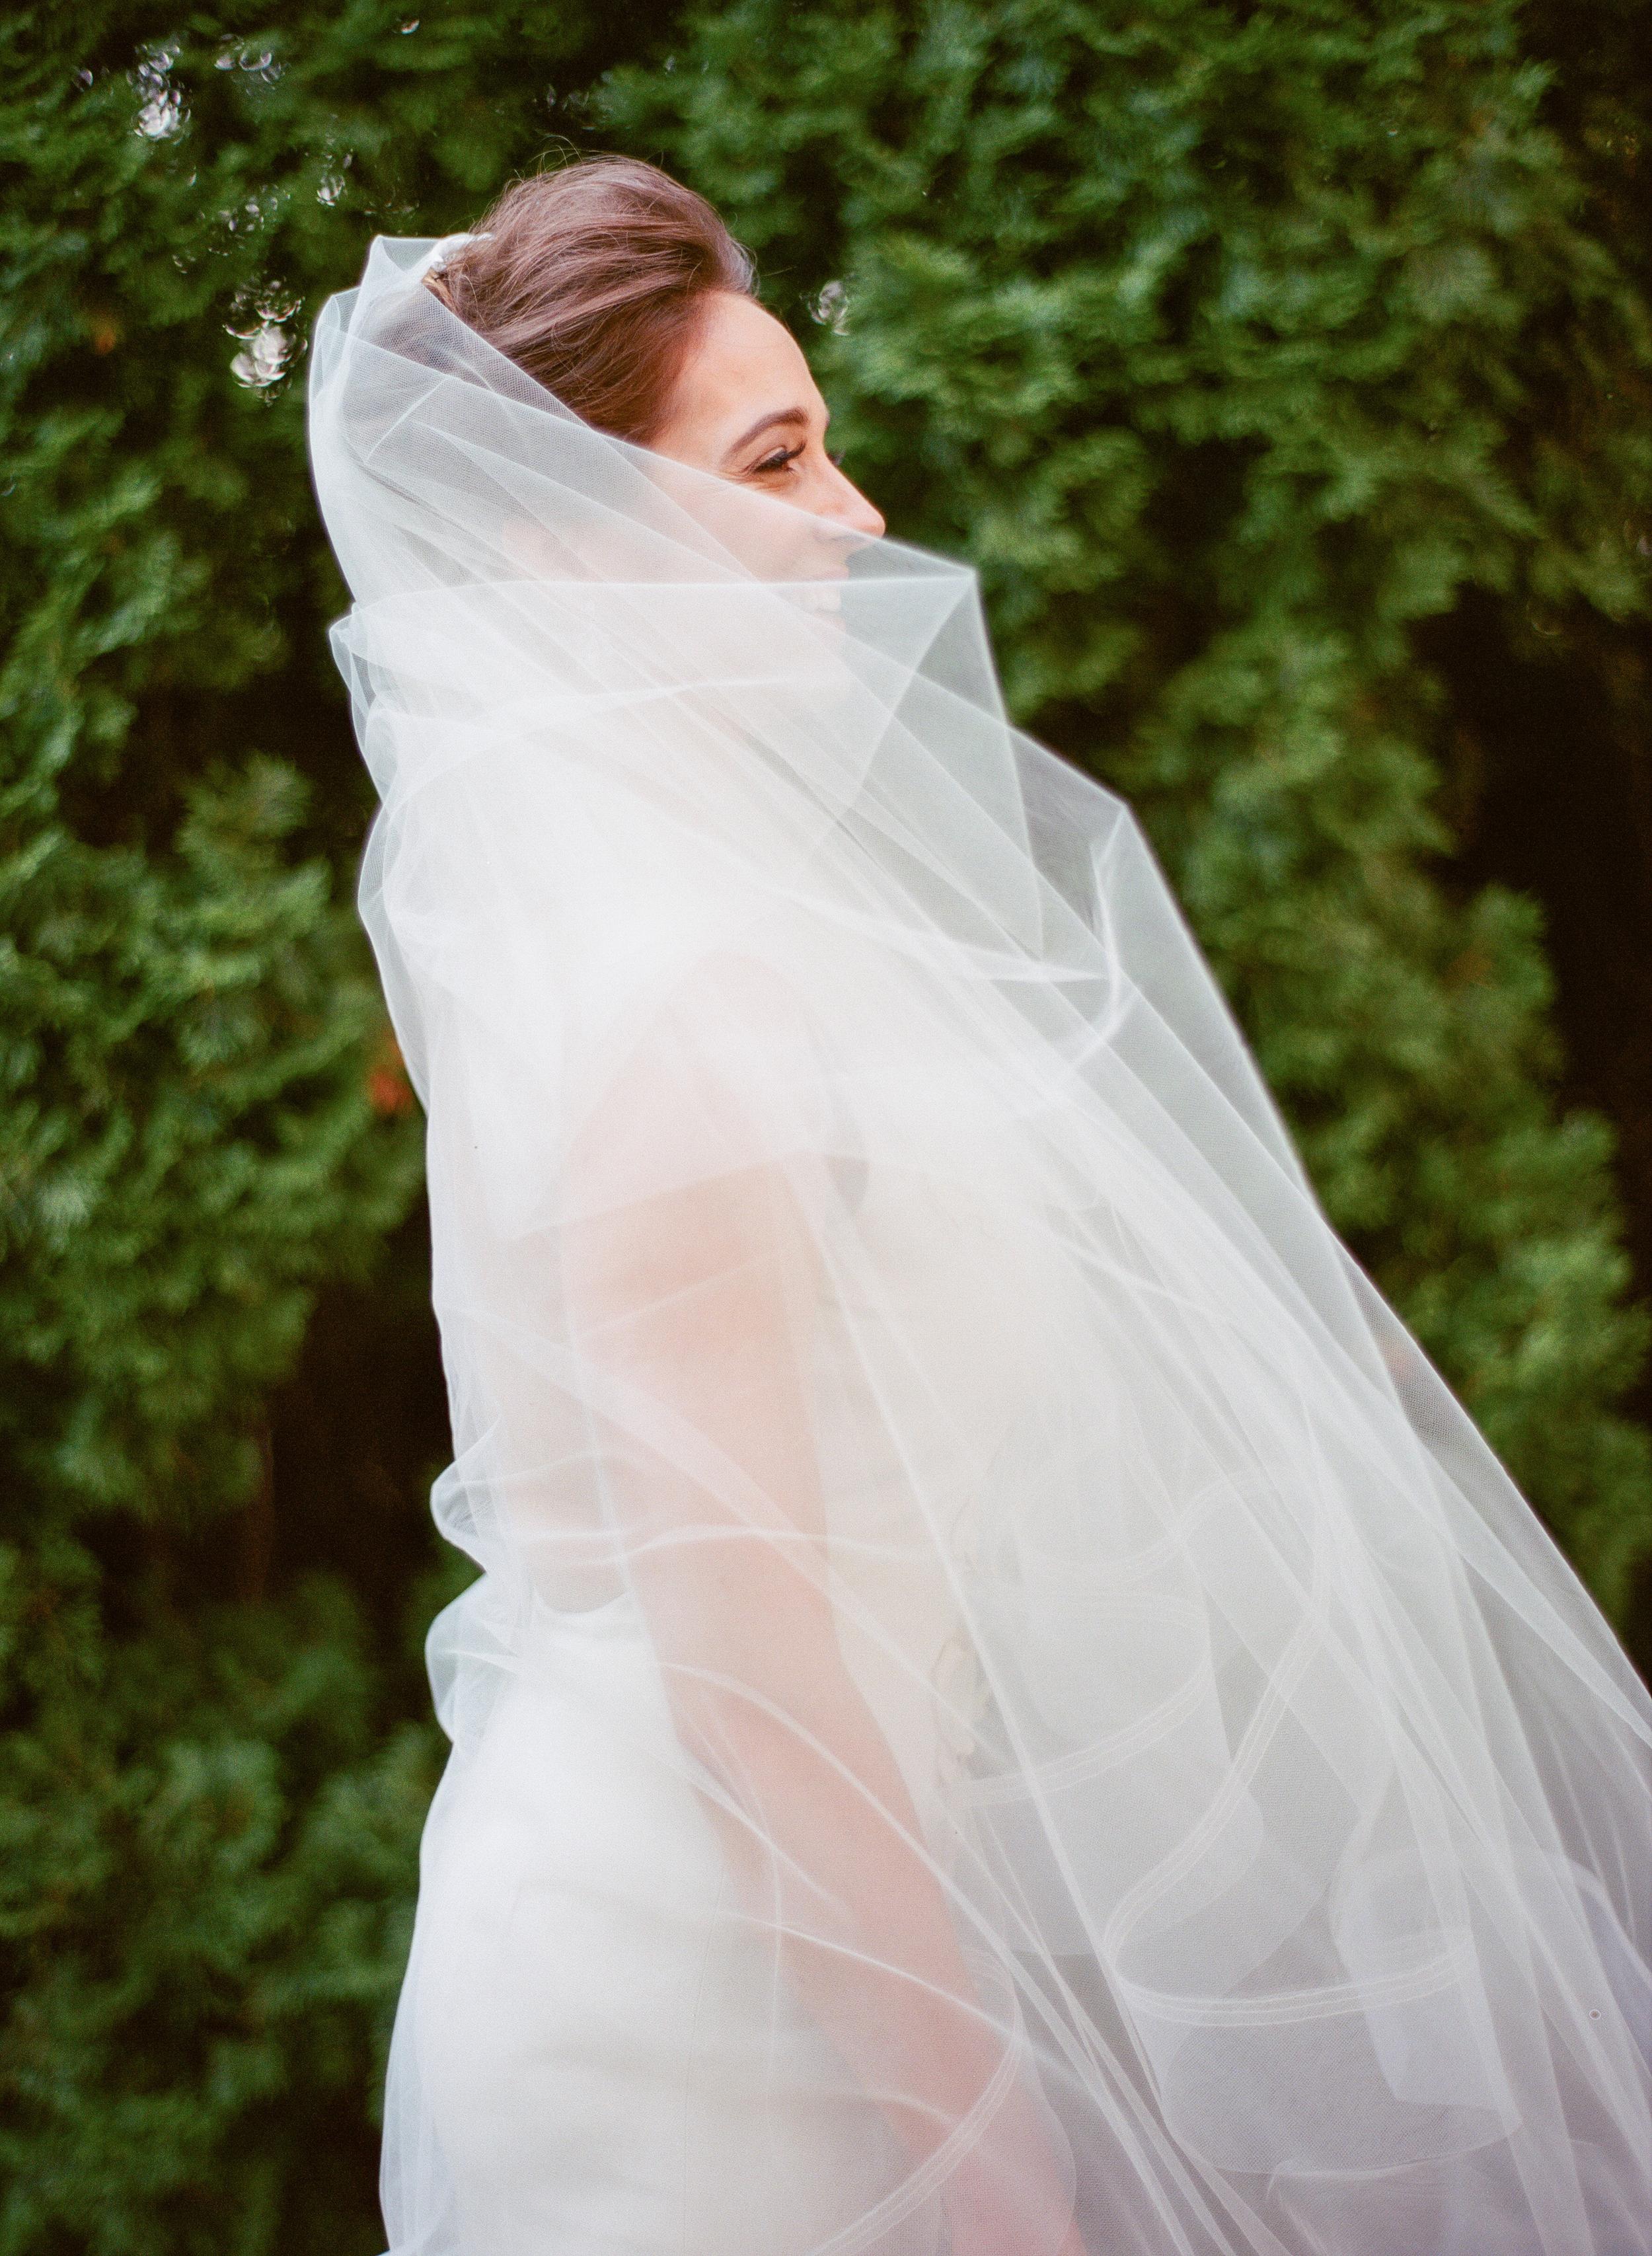 hannah_shih_hanaluluco_cj_isaac_charlie_juliet_ombre_chambray_prospect_park_brooklyn_wedding_34.jpg